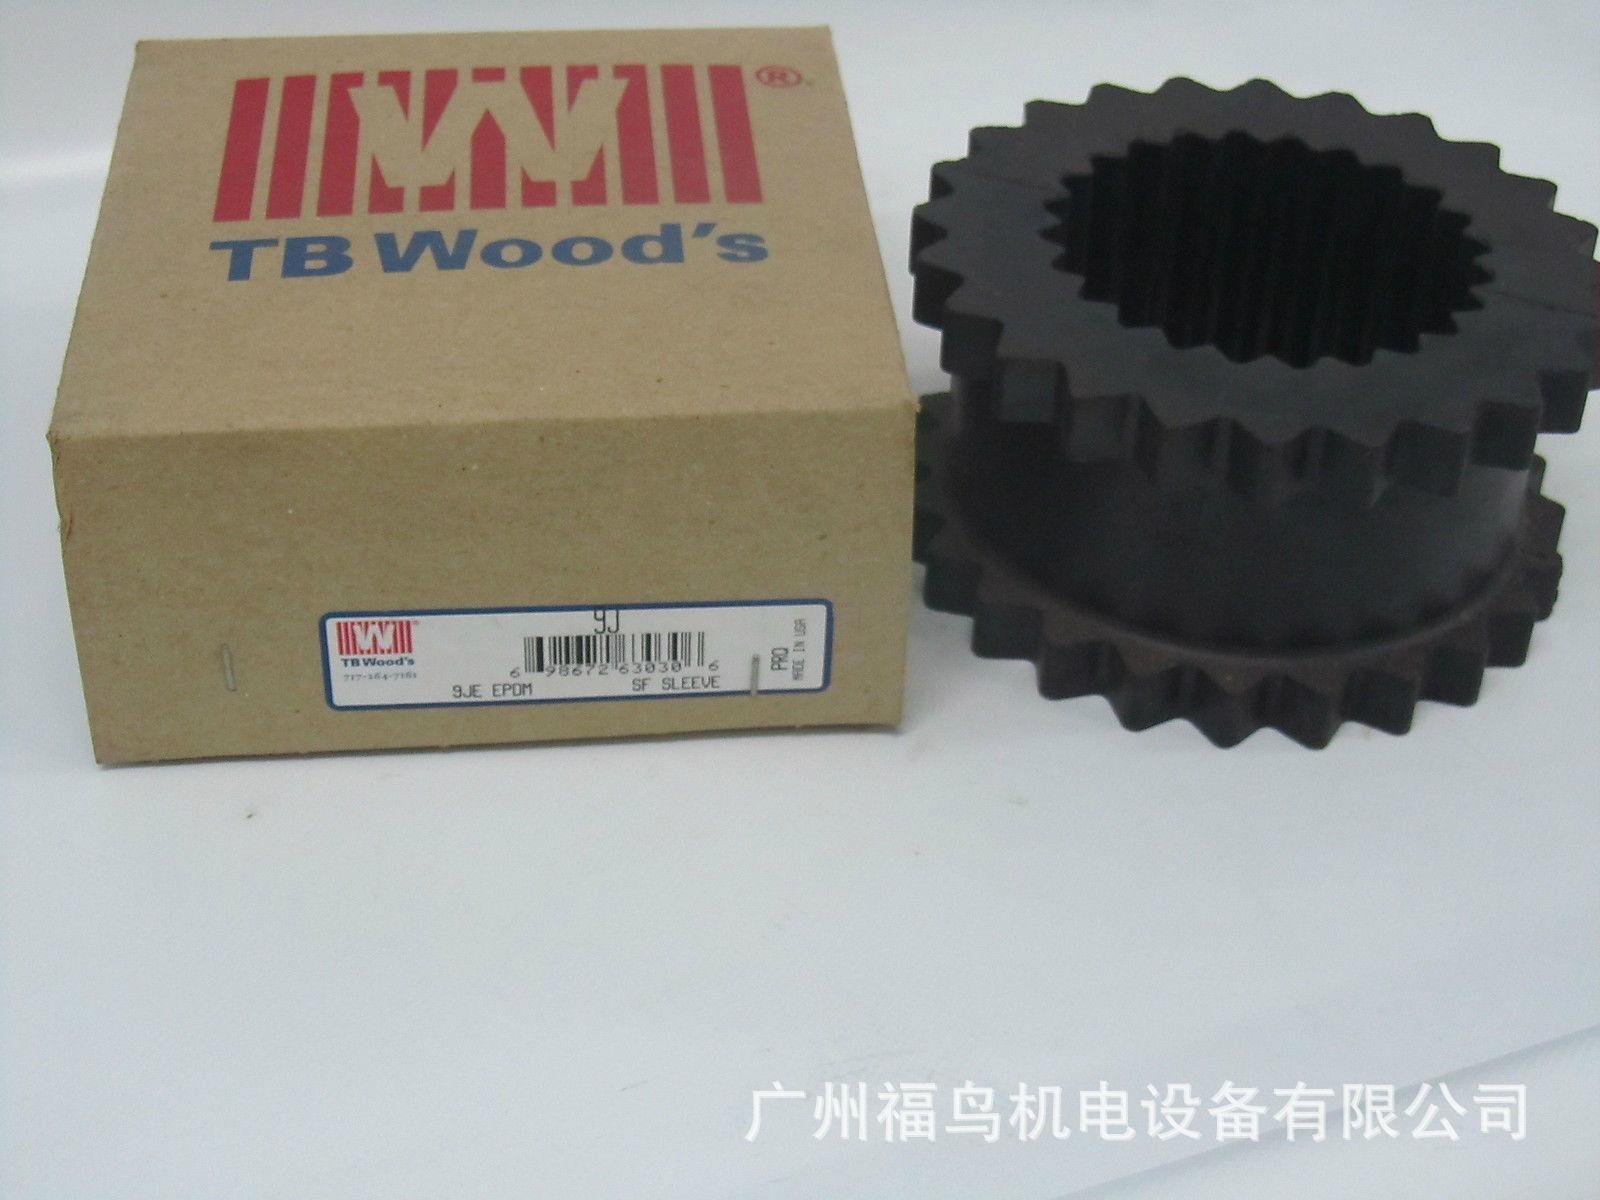 TB WOODS联轴器用橡胶块, 型号:9JE EPDM